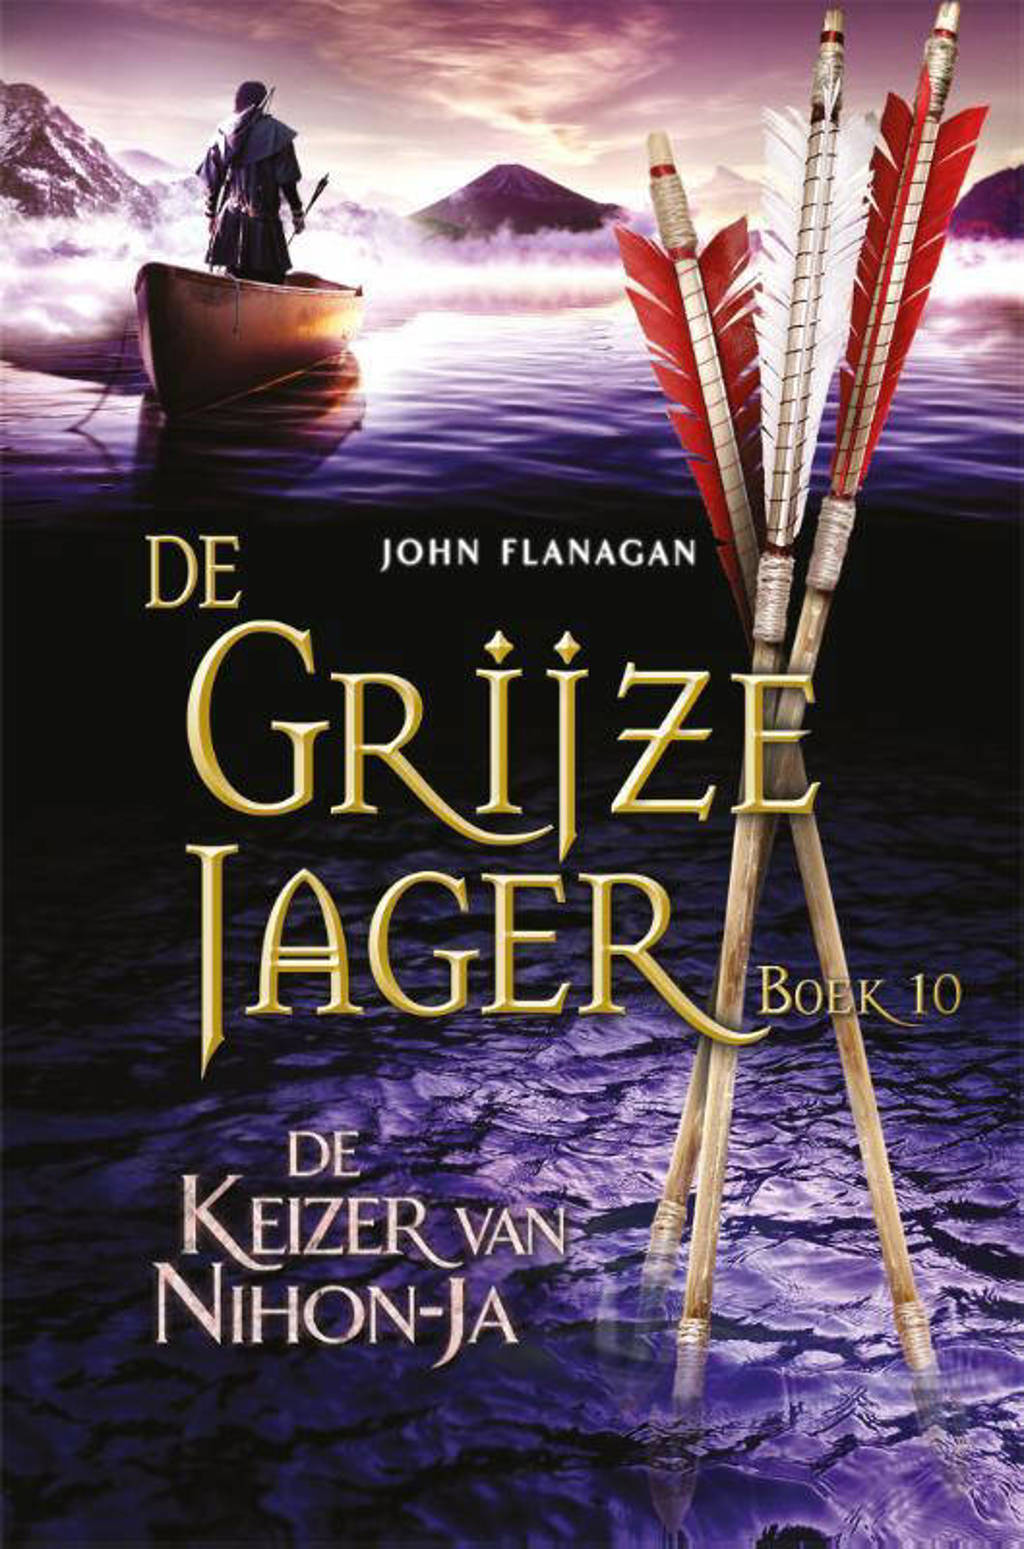 De Grijze Jager: De keizer van Nihon-Ja - John Flanagan